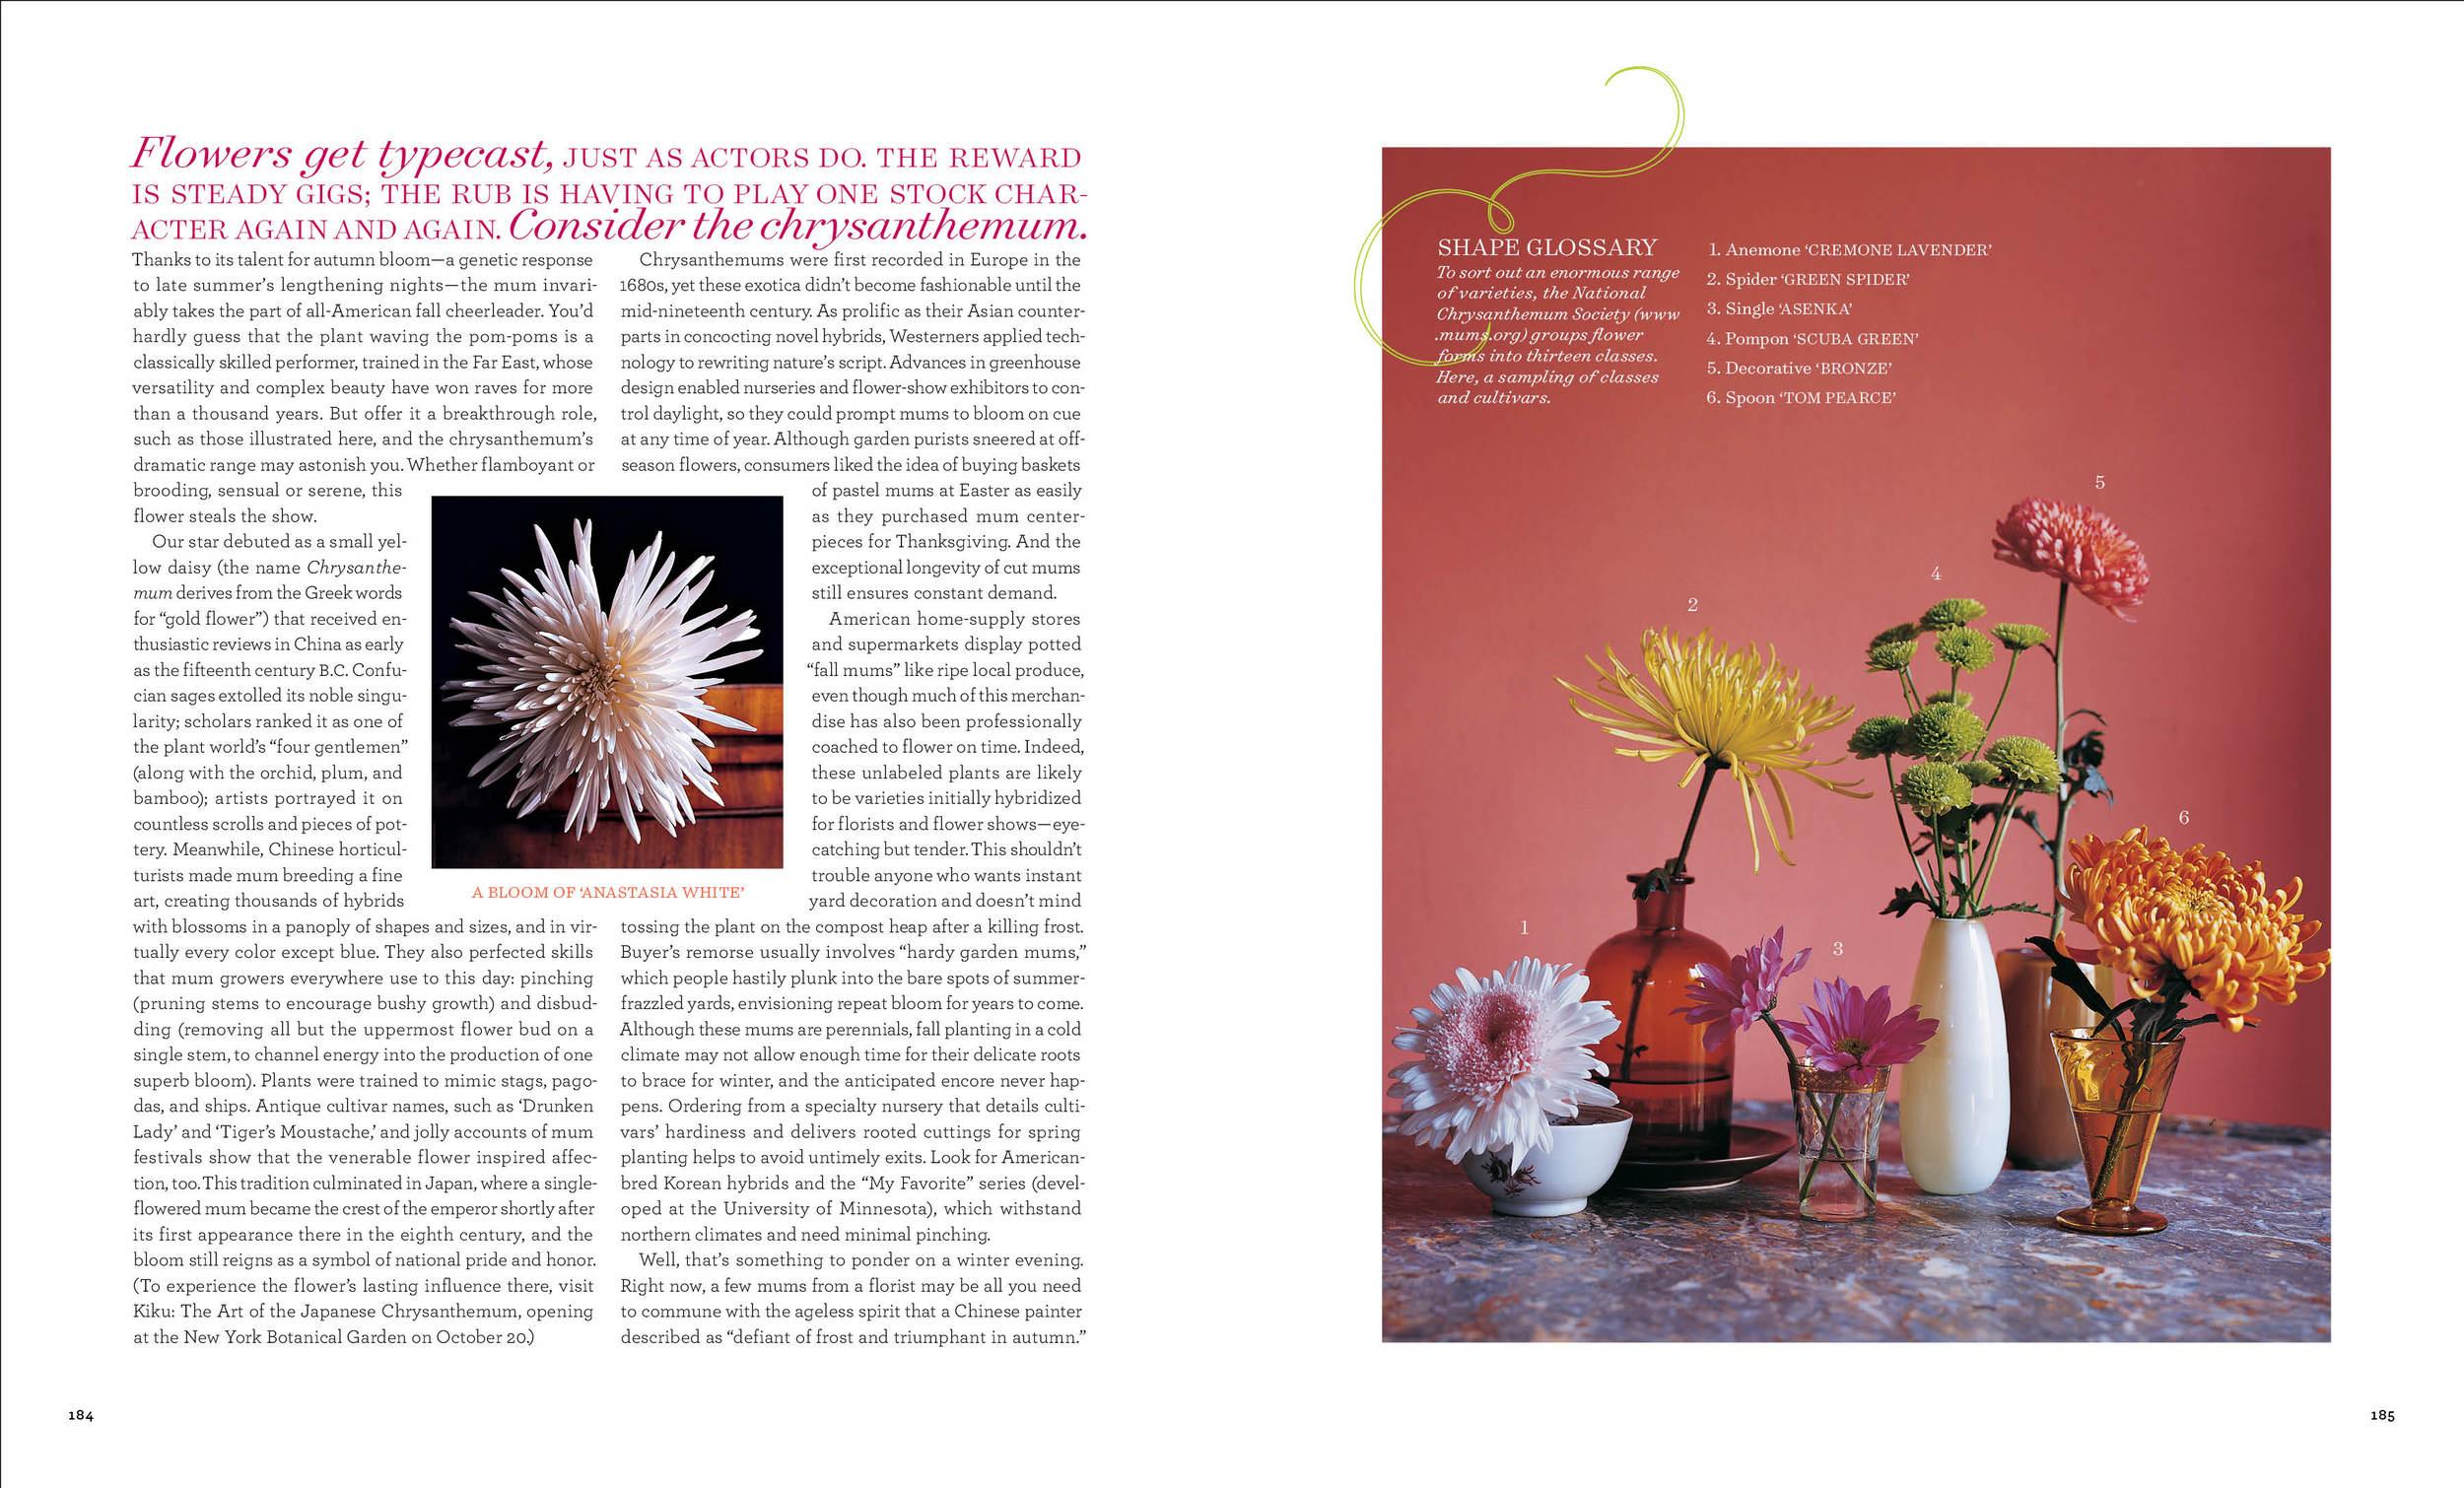 Chrysanthenum2 copy.jpg